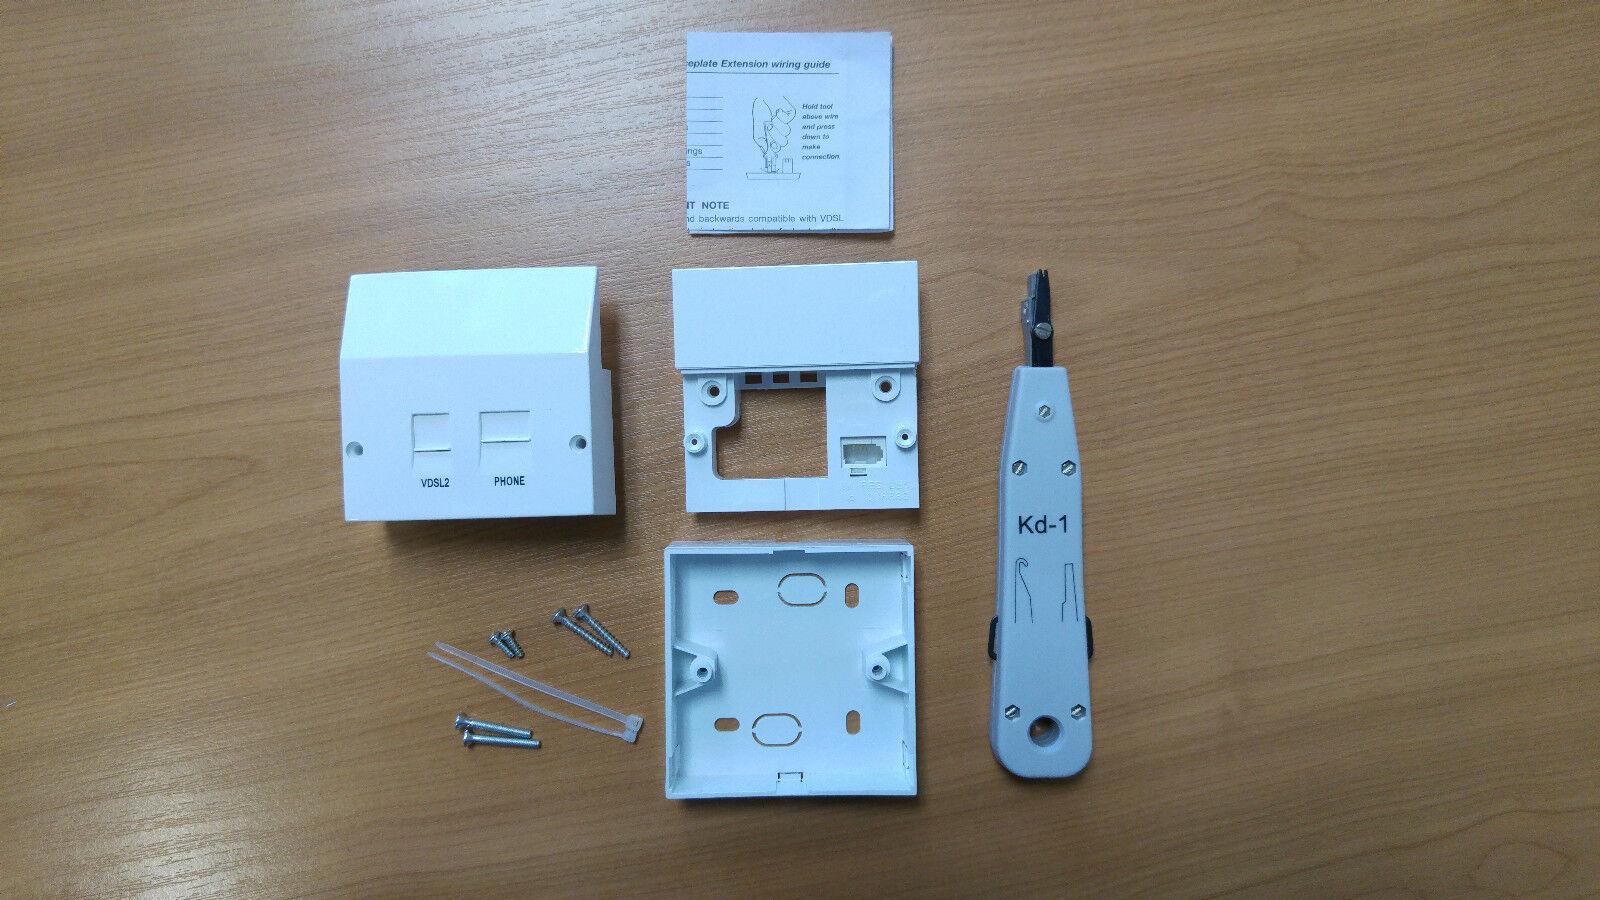 BT OPENREACH TYPE Master Telephone Socket Nte5 Box Tool Vdsl2/adsl ...